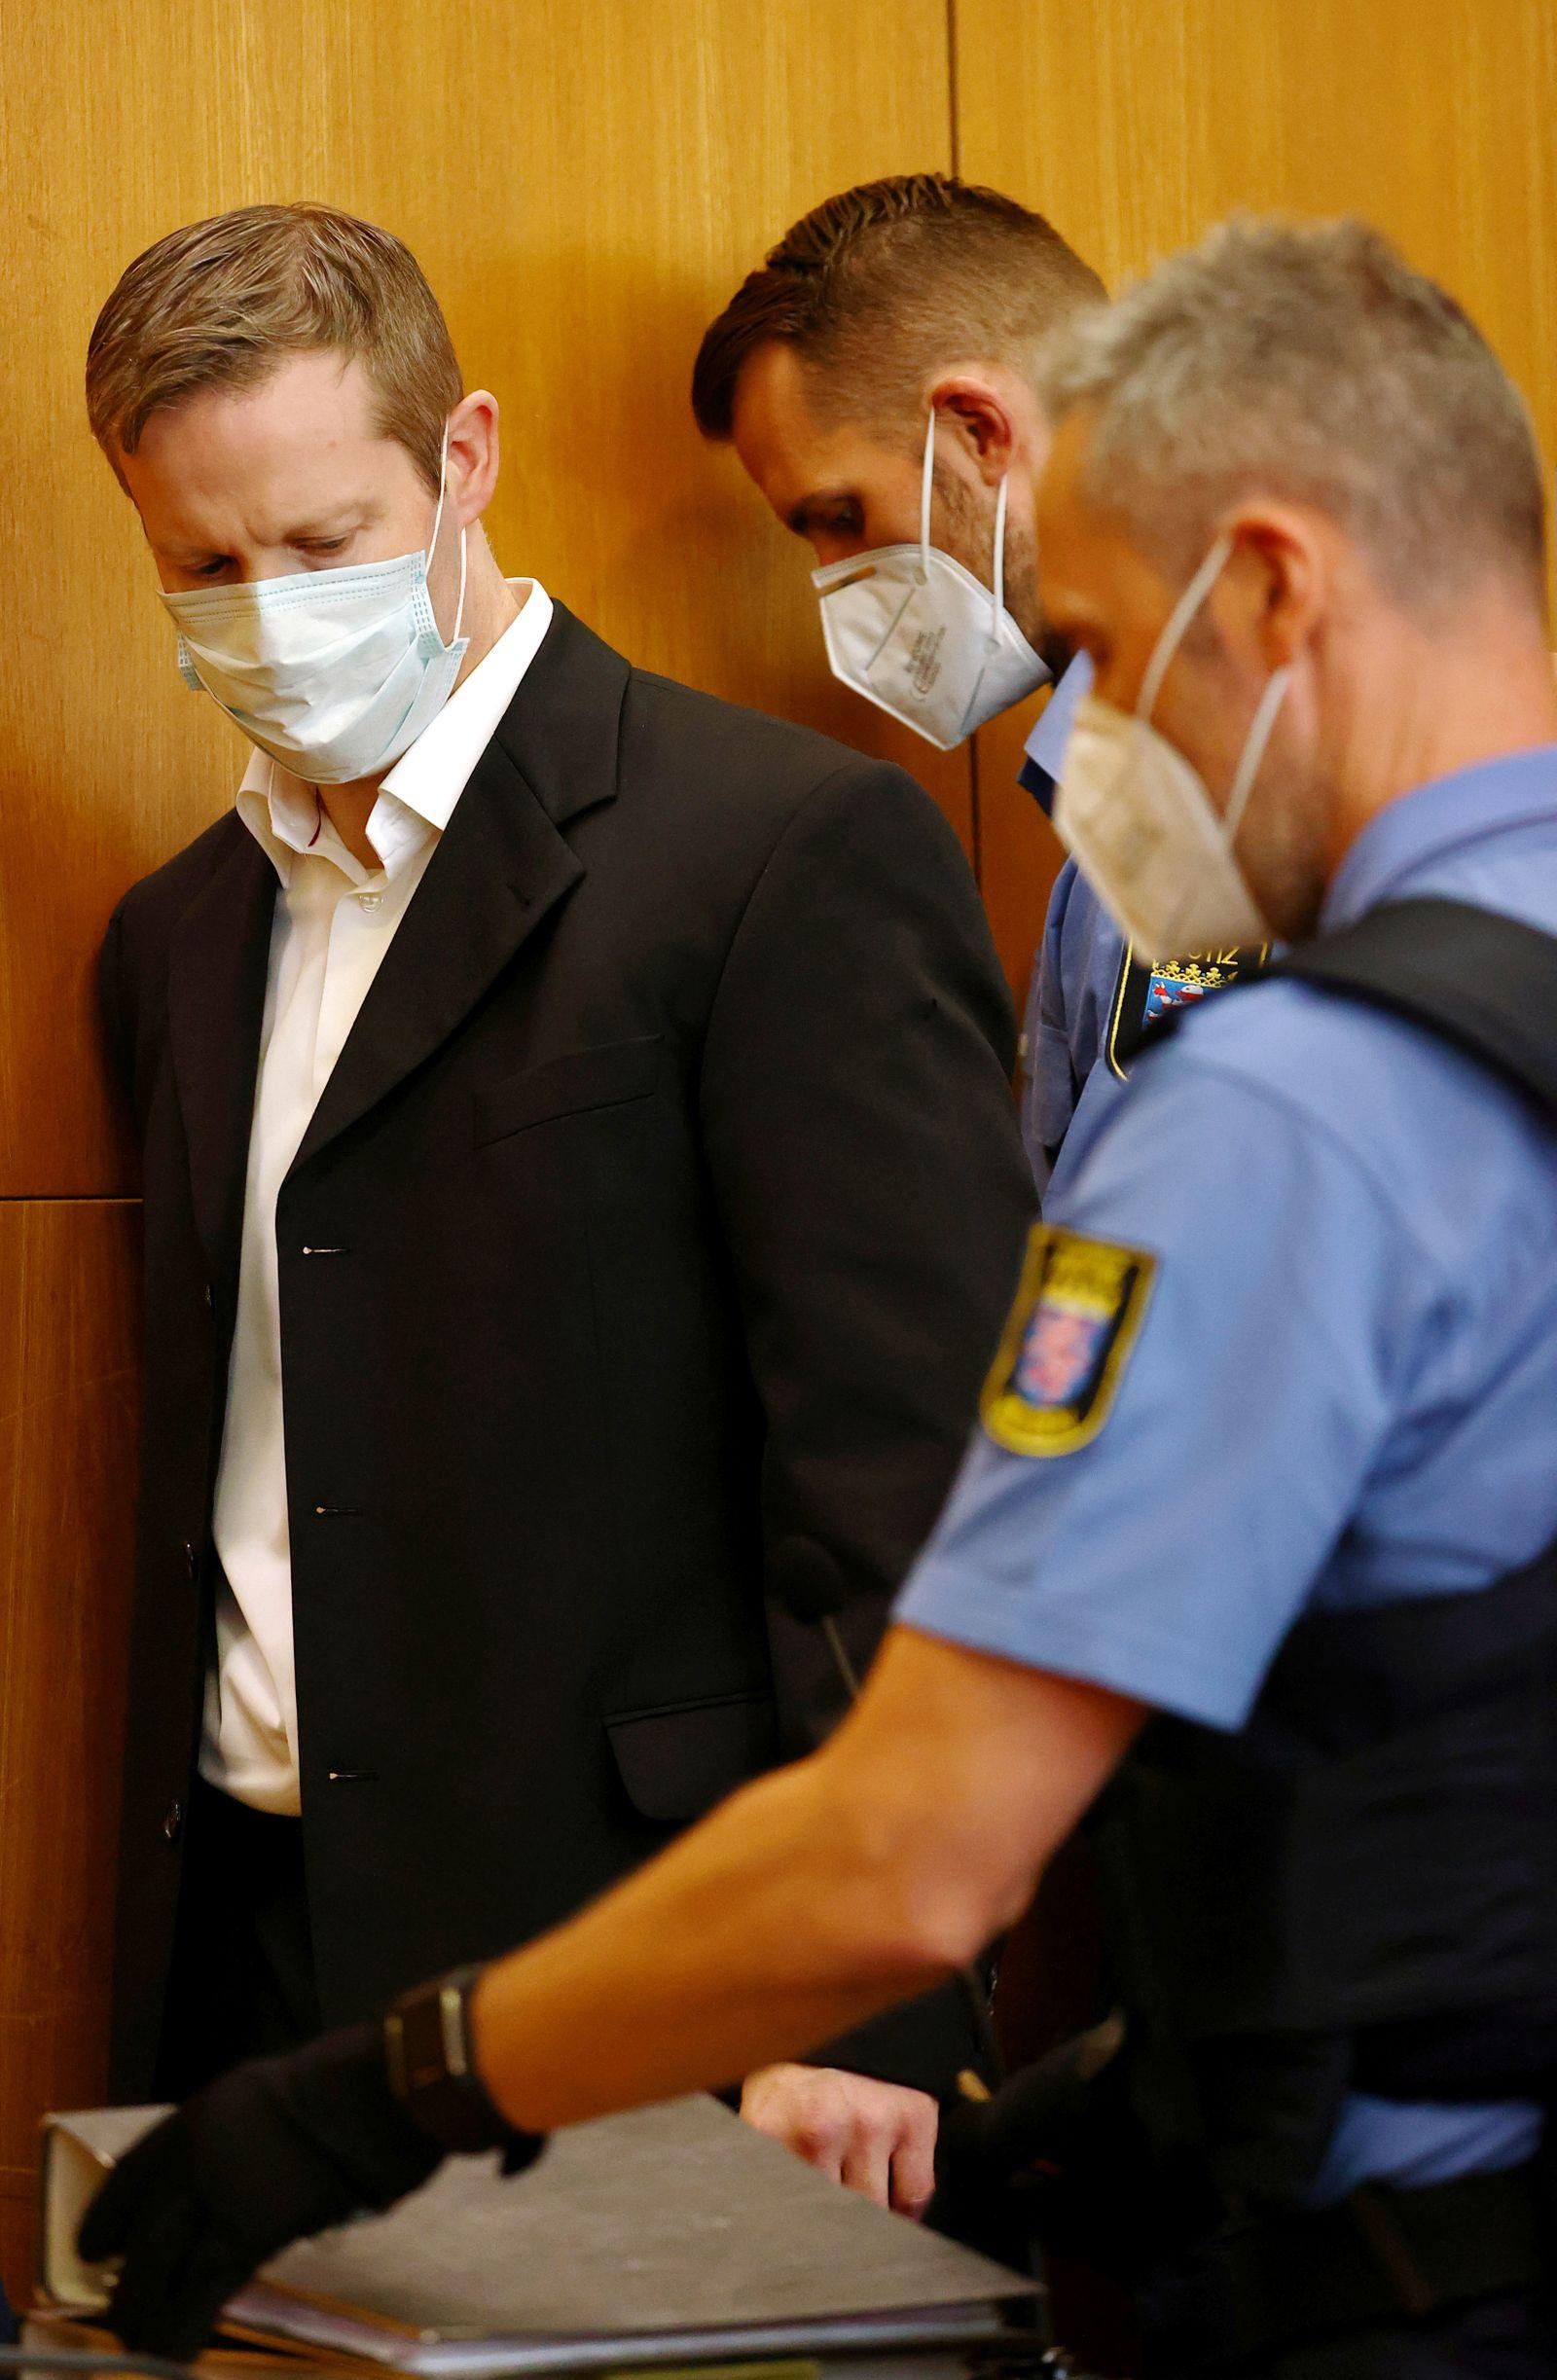 Walter Luebcke Murder Trial Continues In Frankfurt